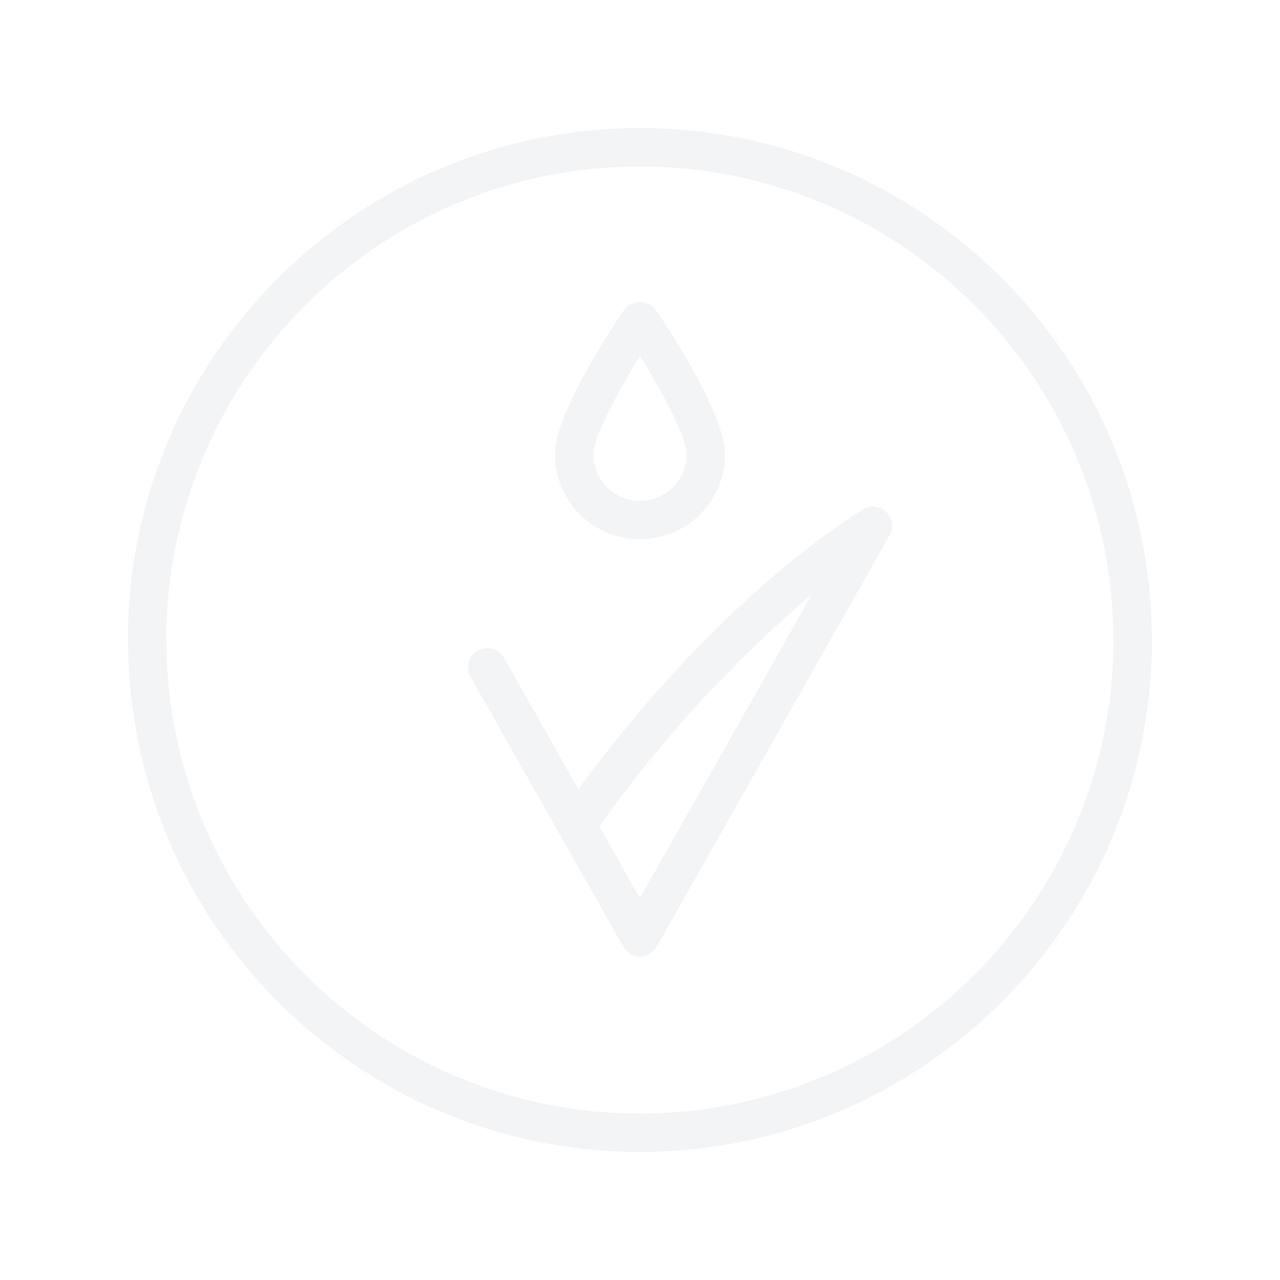 MISSHA Real Solution Tencel Pure Whitening Sheet Mask 25g